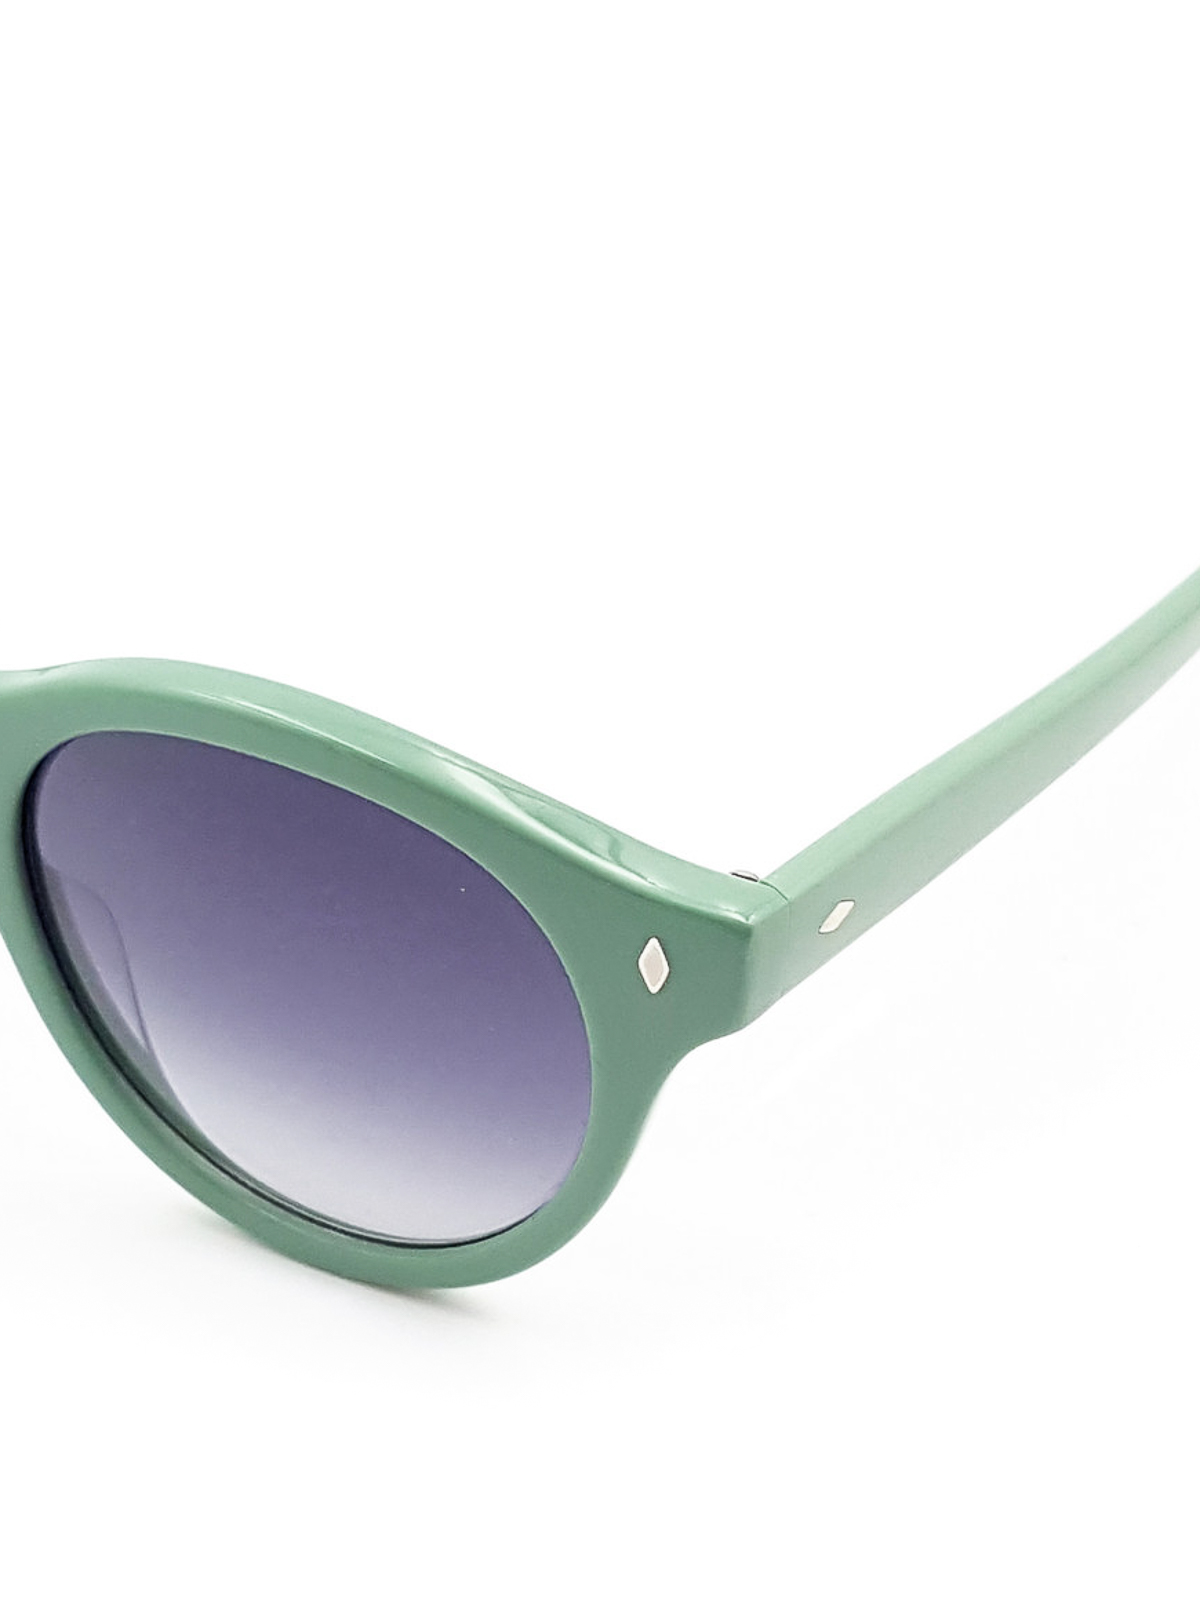 b3b1fdb17c iKRIX CUTLER AND GROSS: Gafas de sol - Gafas De Sol Verdes Para Unisex